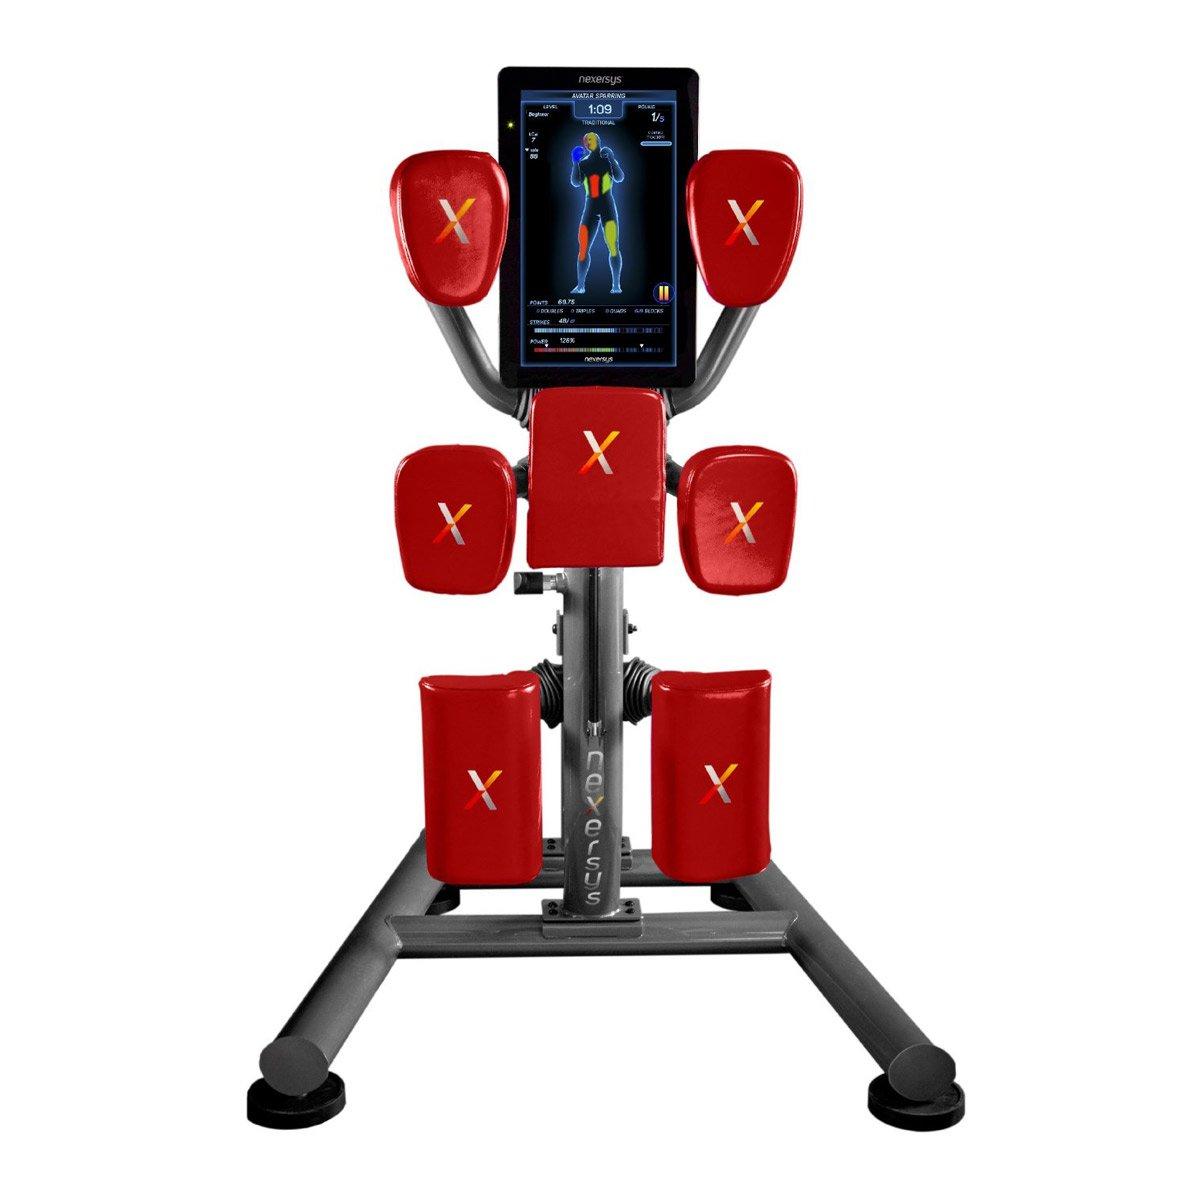 Nexersys Pro Interactive Mixed Martial Arts Trainer